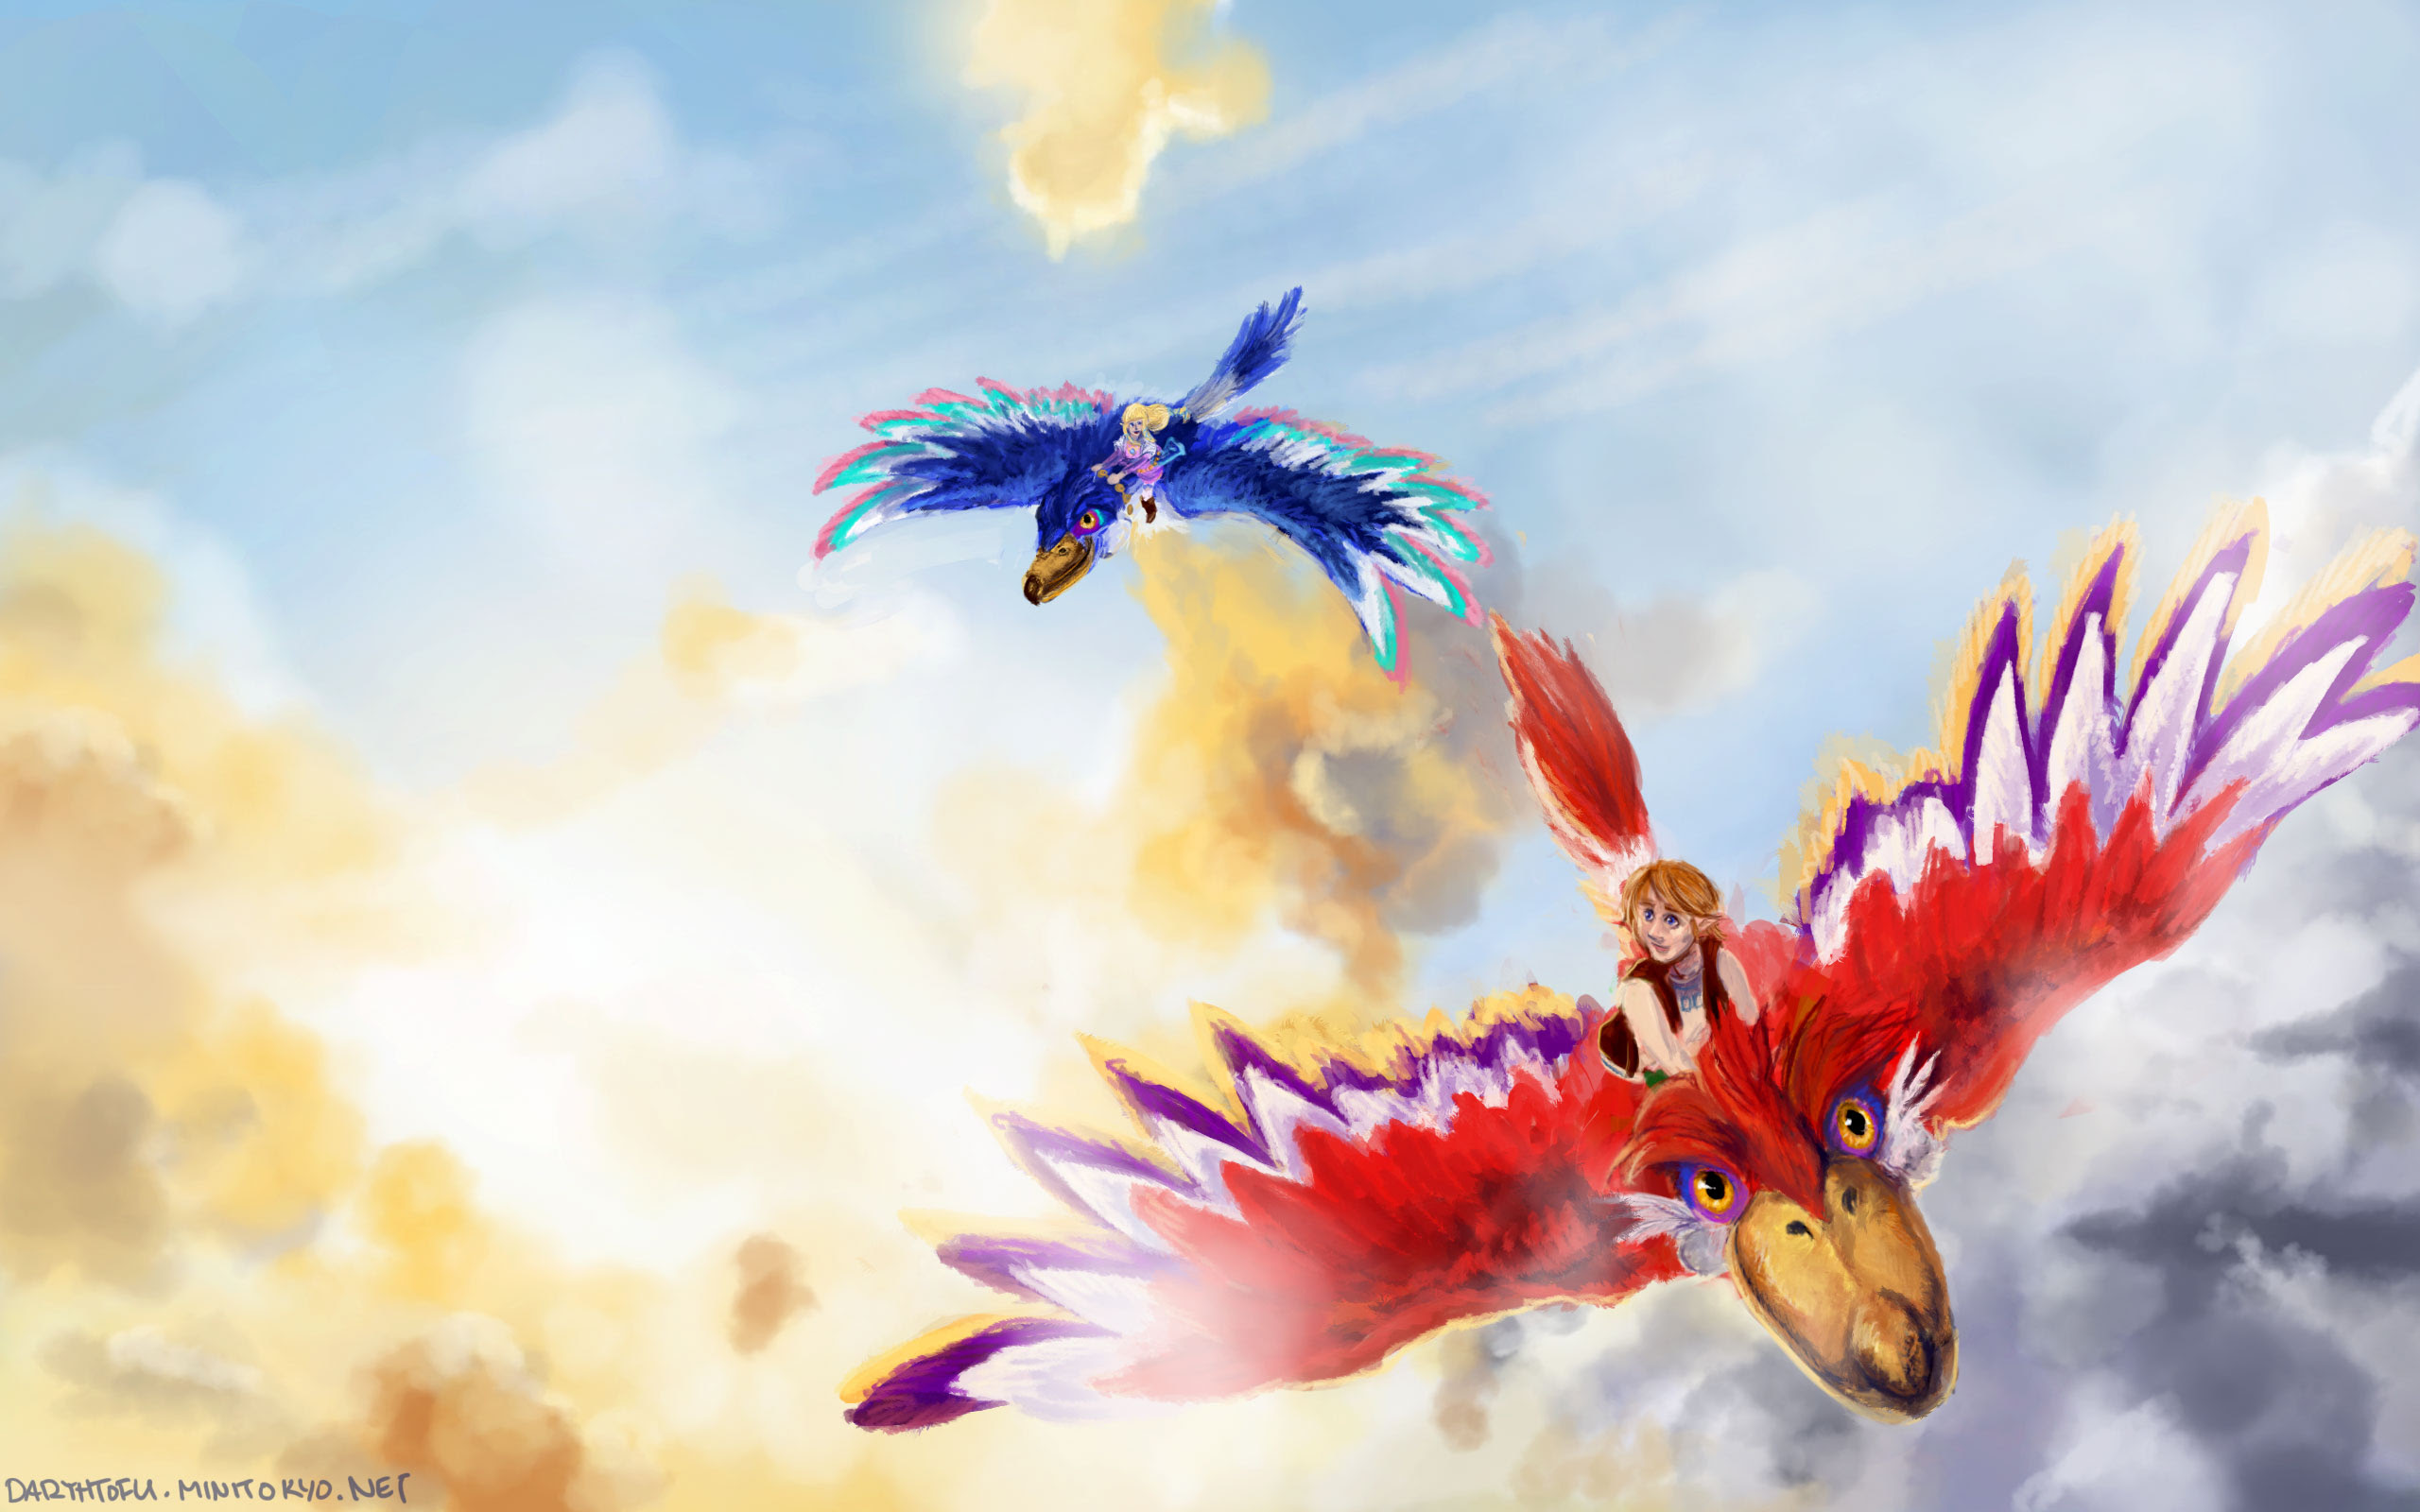 The Legend Of Zelda Skyward Sword Wallpaper Flying Minitokyo